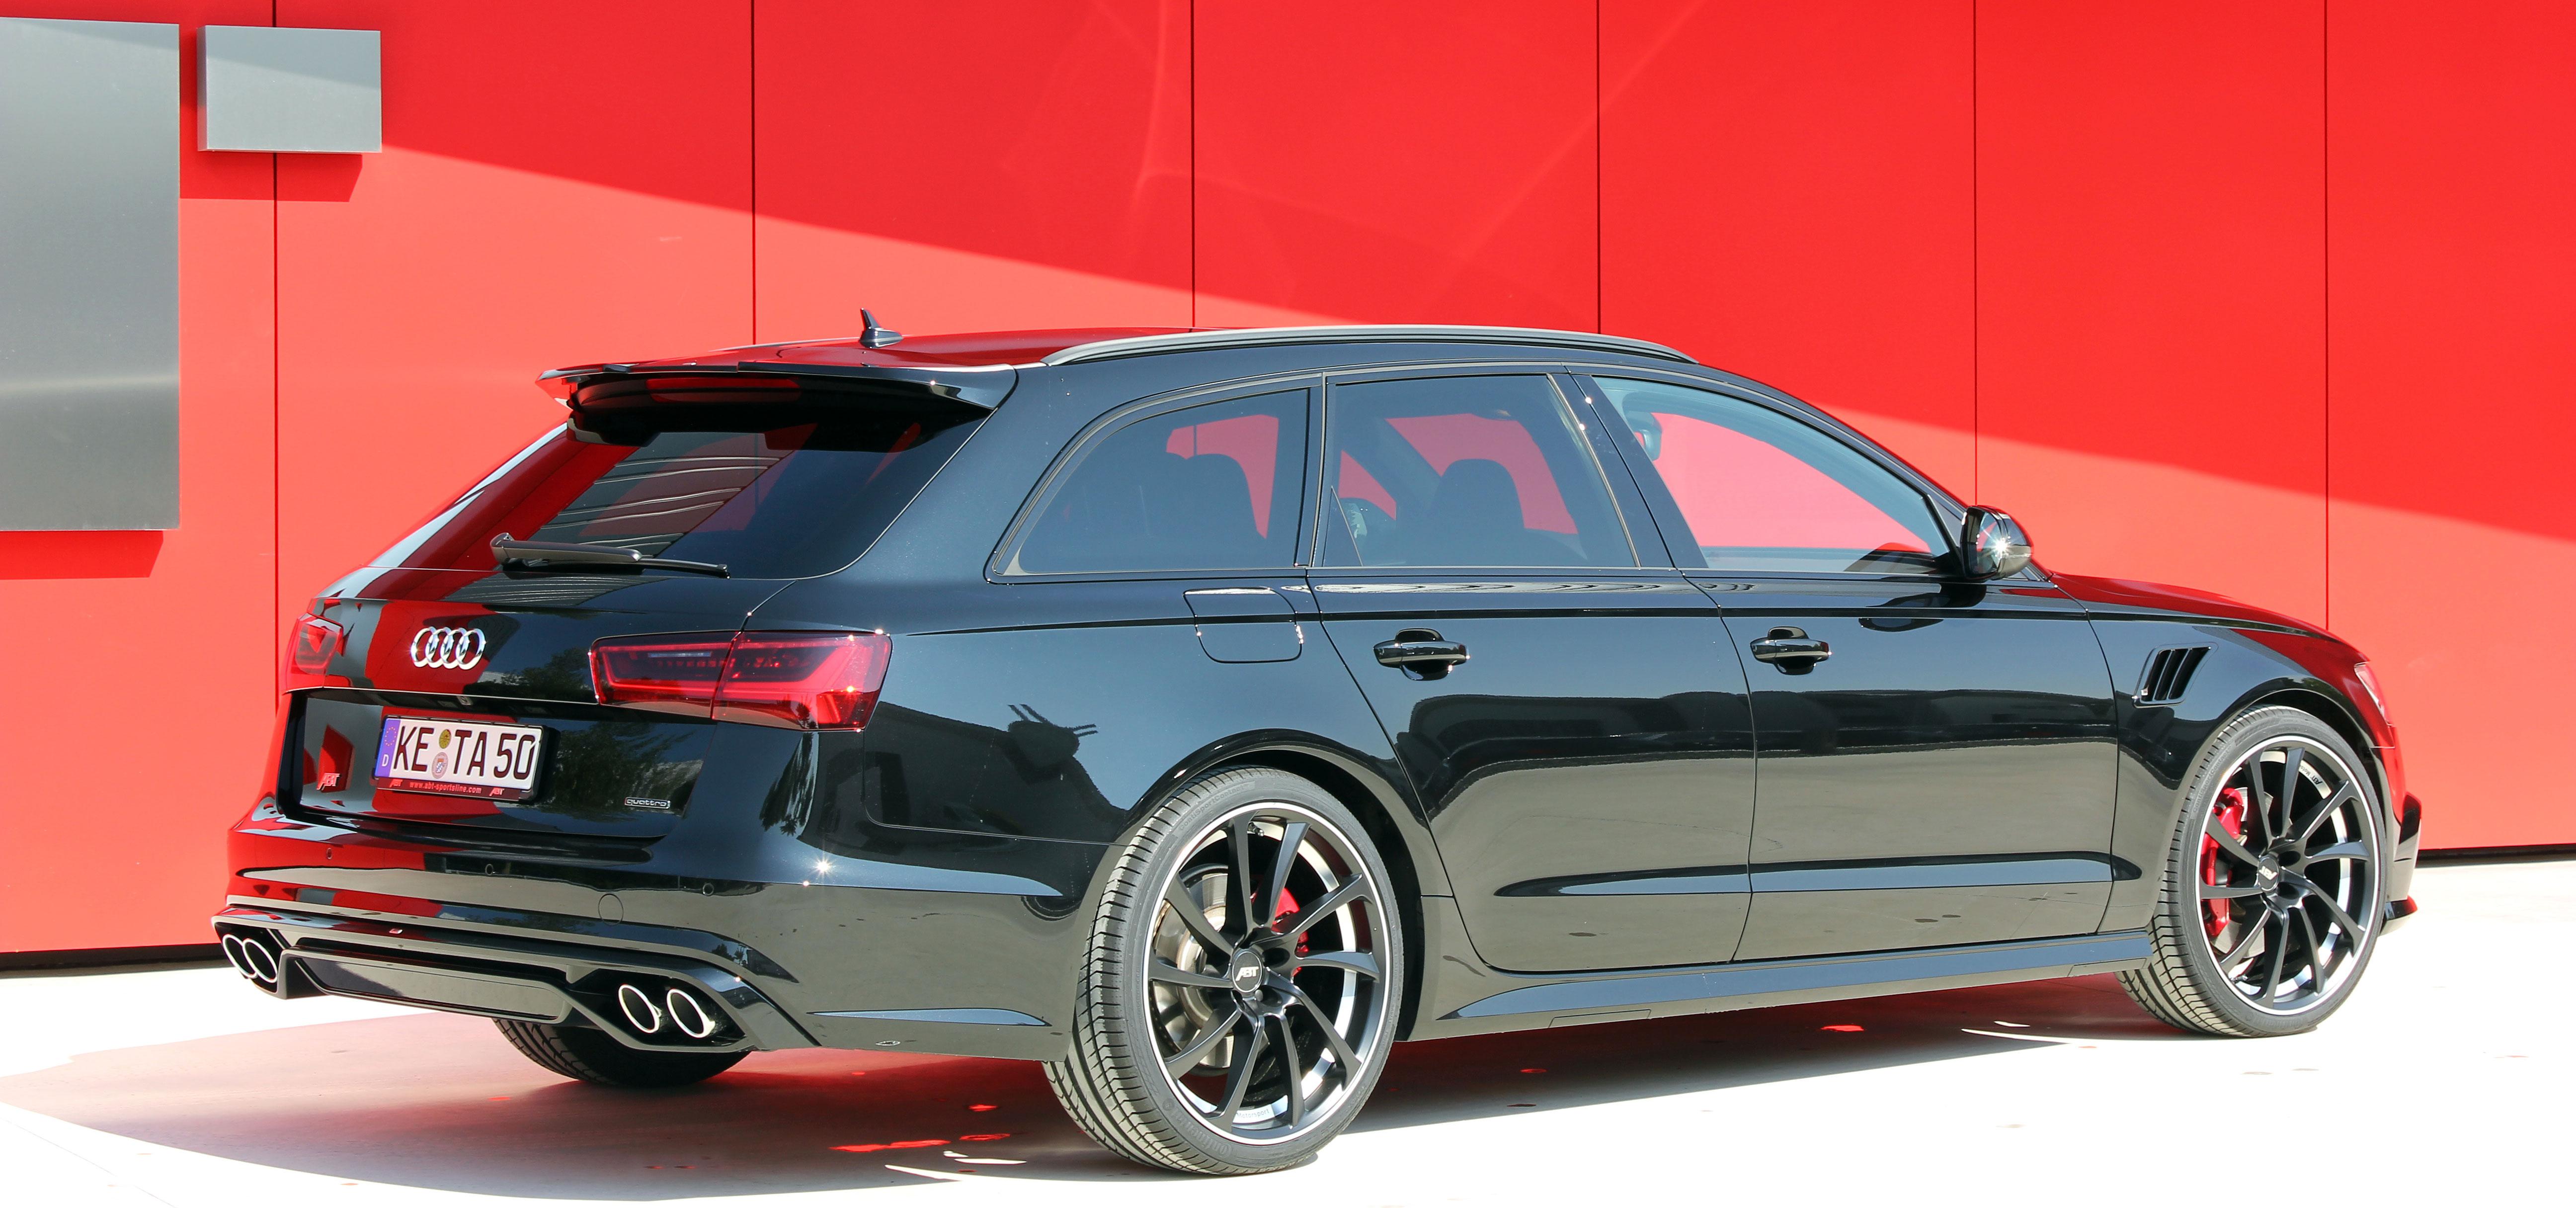 Audi A ABT Sportsline - Audi a 6